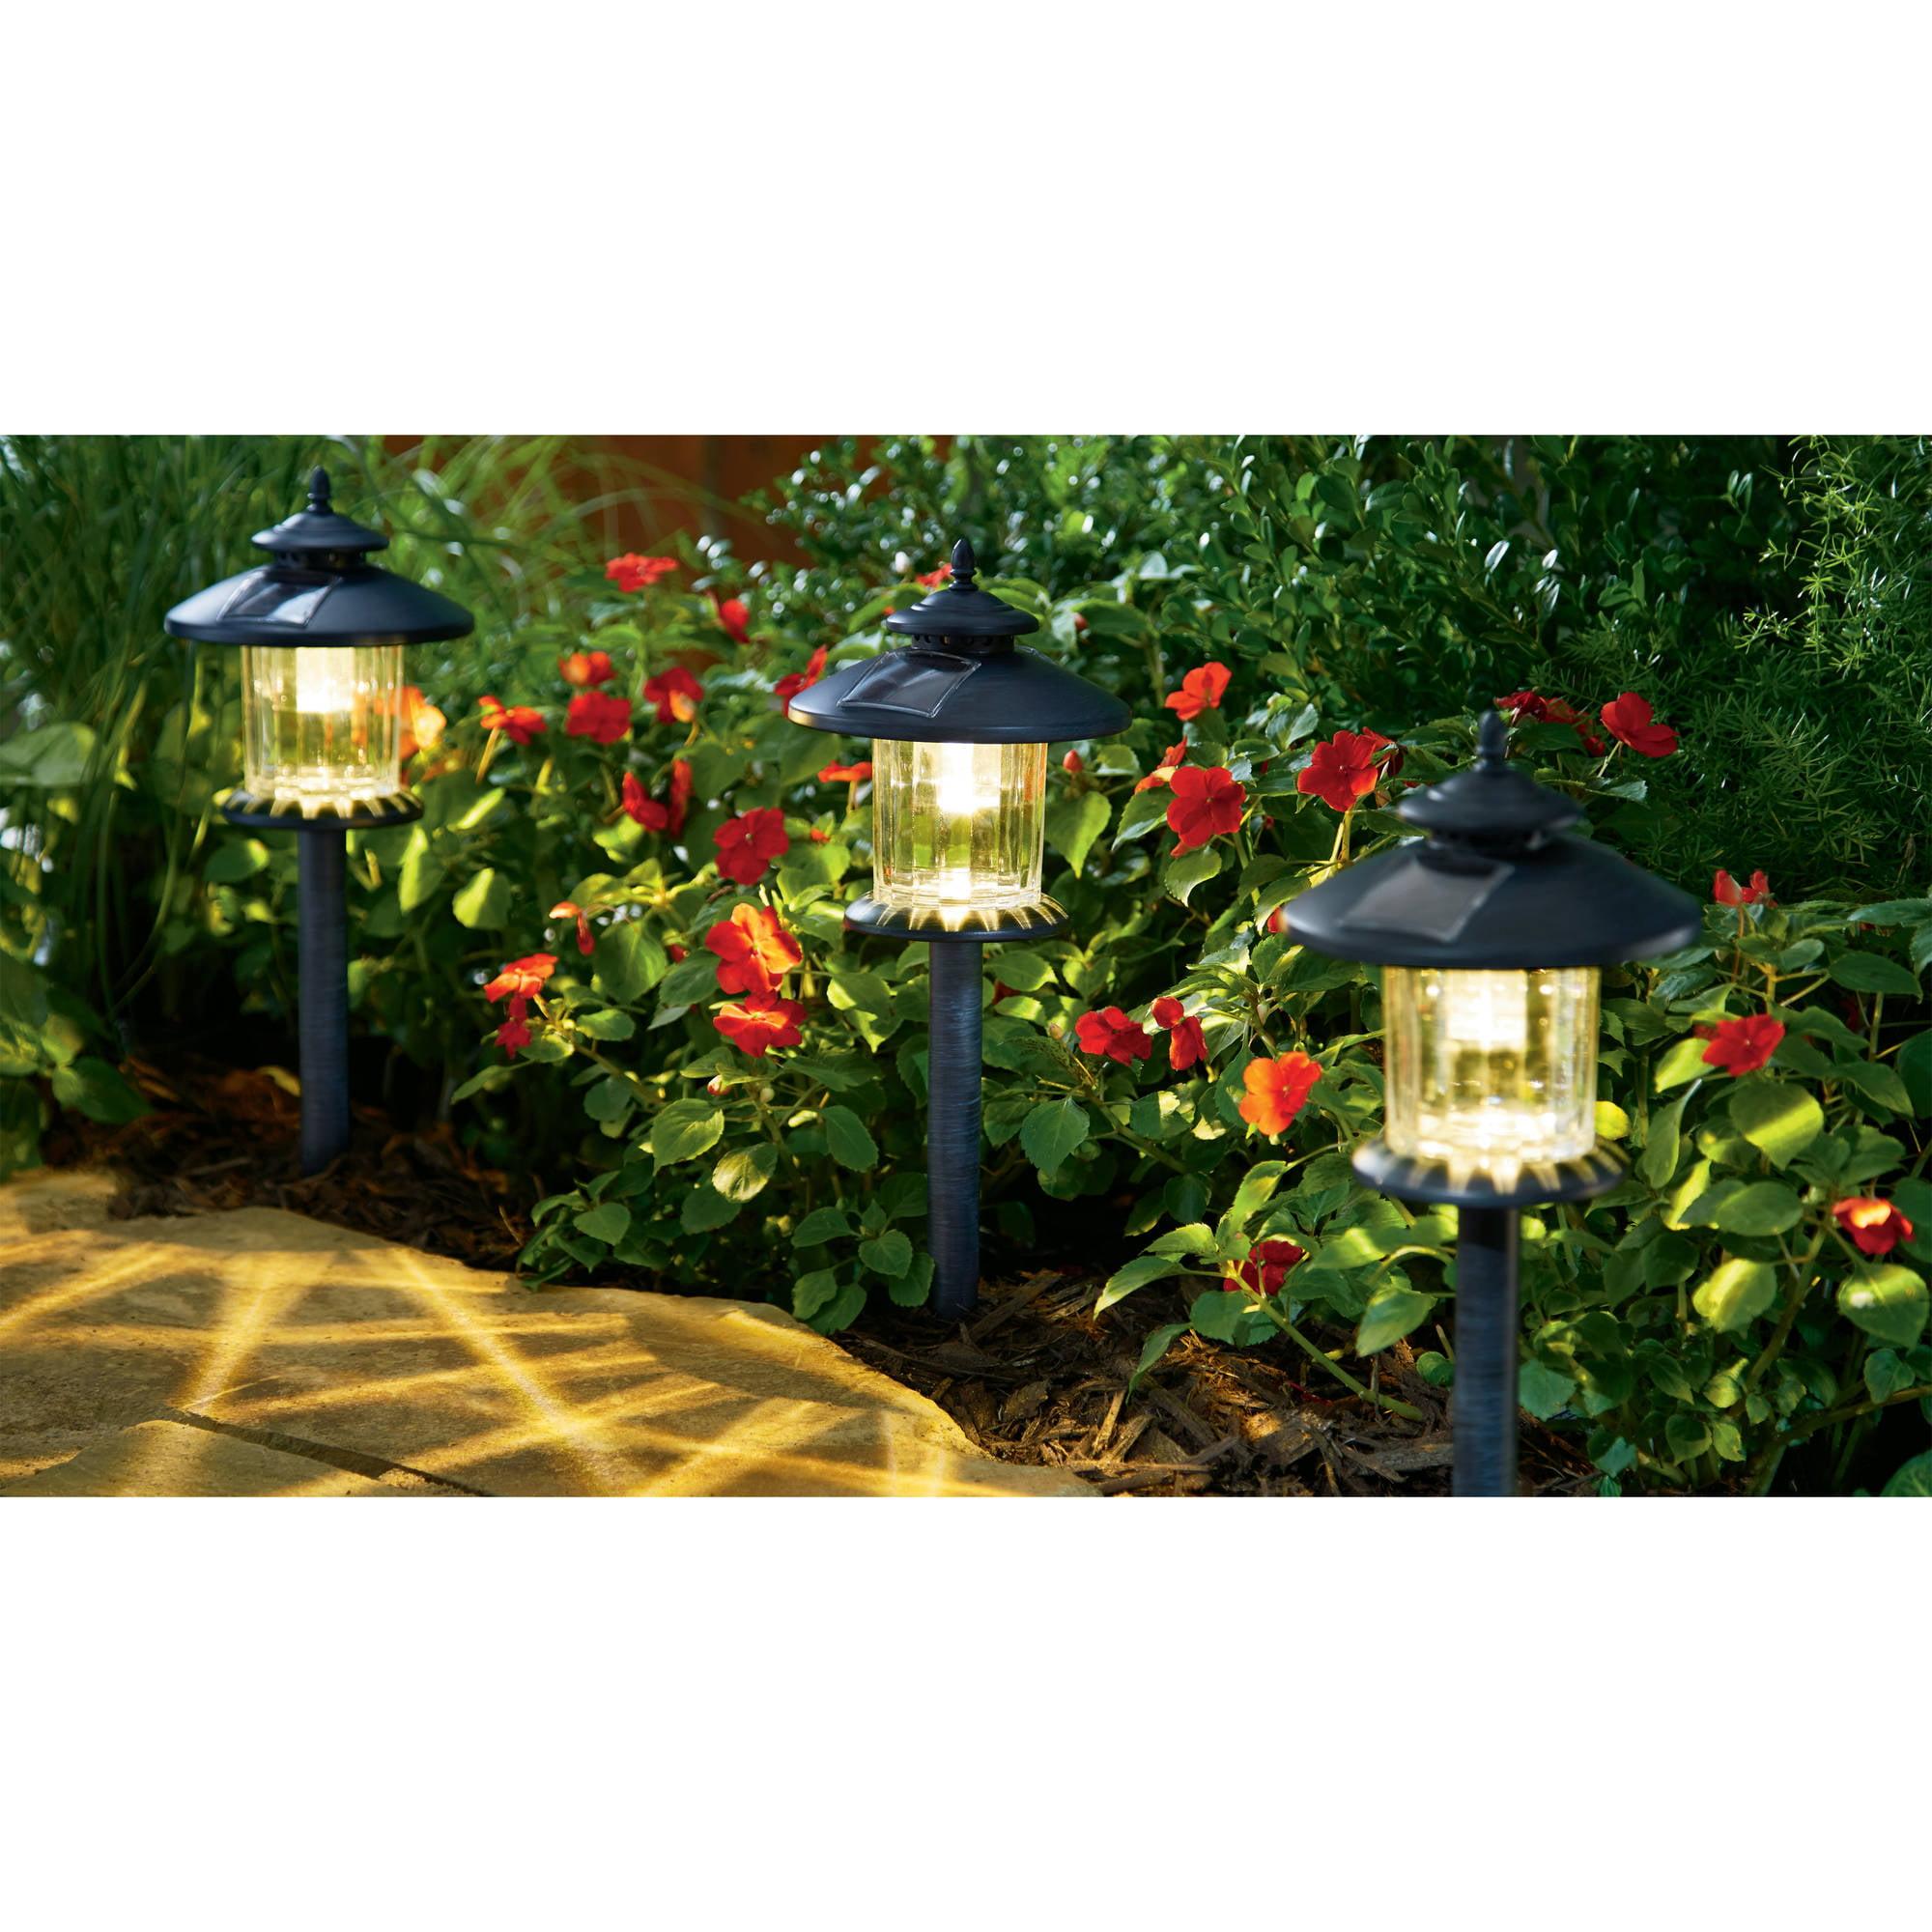 Better Homes and Gardens Covington Solar-Powered Landscape Light Set